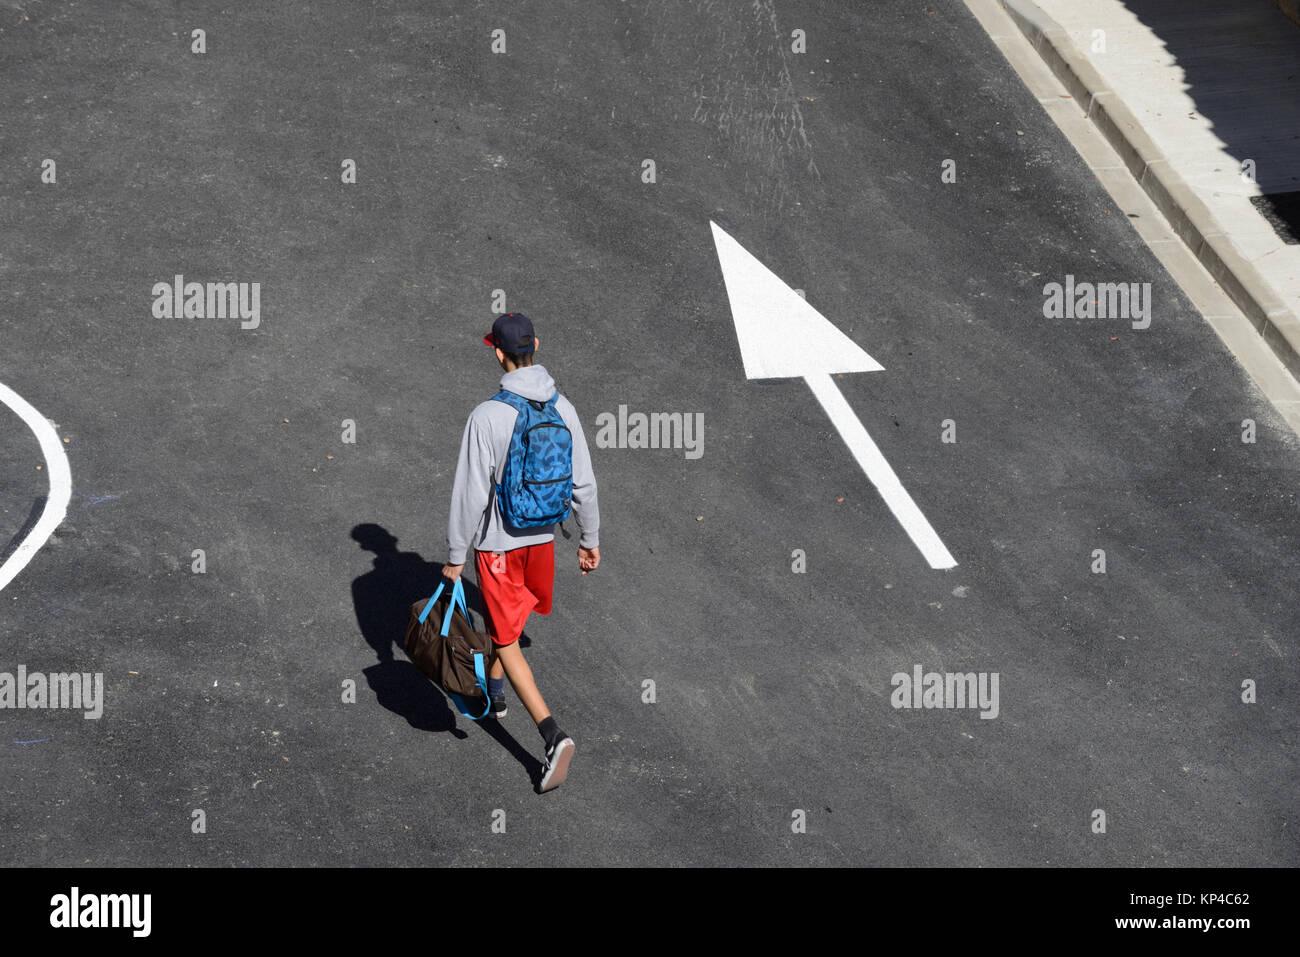 Man Walking Down Street Following Directional Arrow Aigues-Mortes, Gard, France - Stock Image